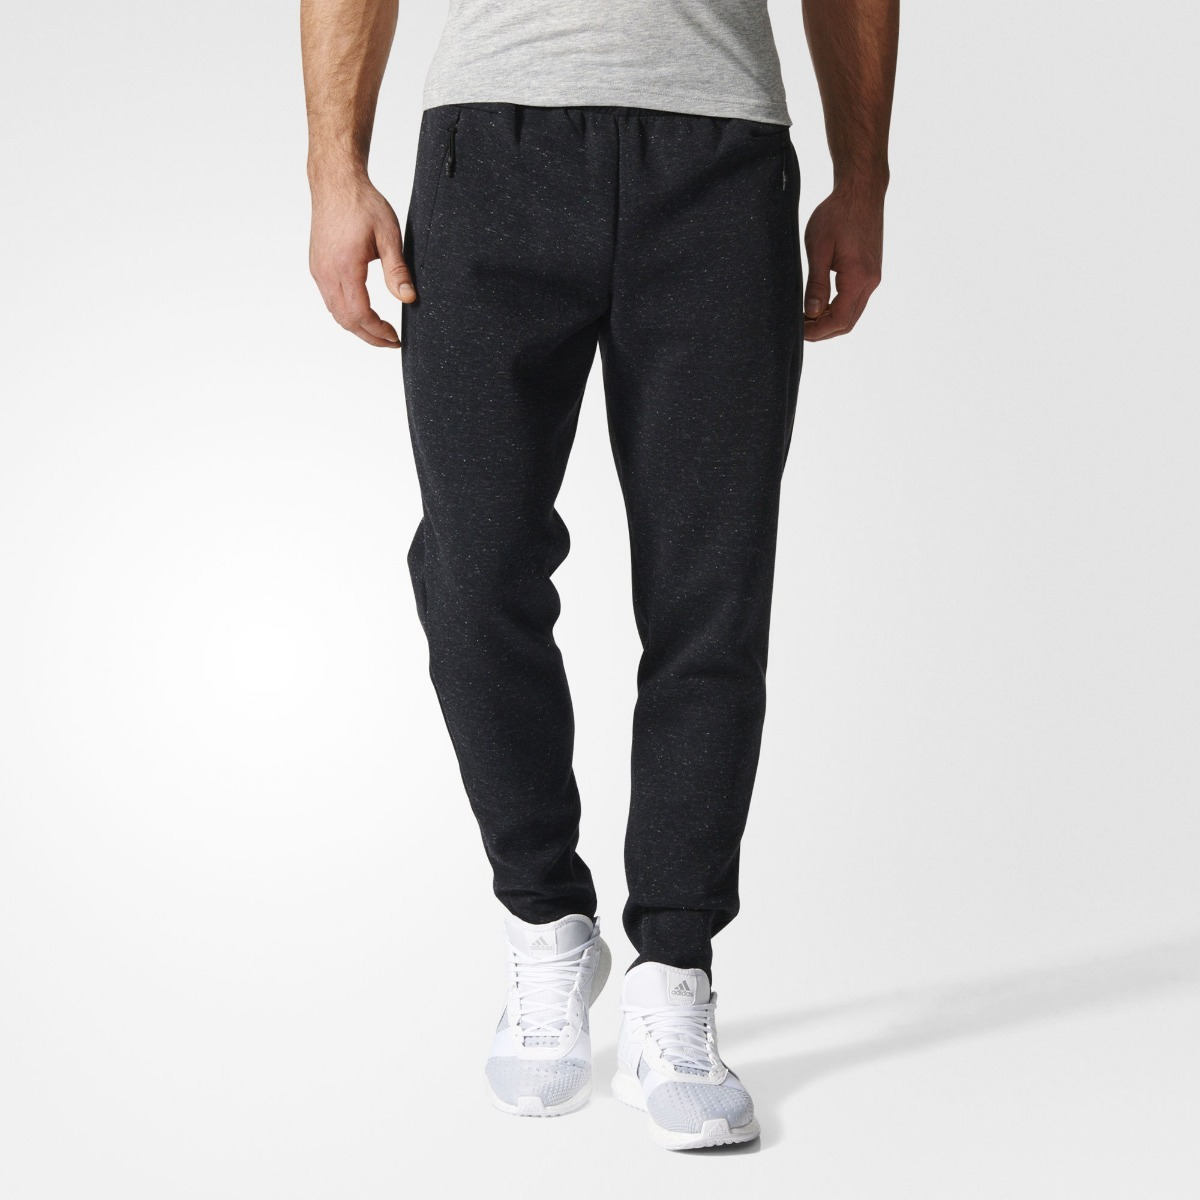 Hombre Hombre Algodon Algodon Pantalon Pantalon Adidas Adidas Pantalon Algodon Adidas 8On0PkXw